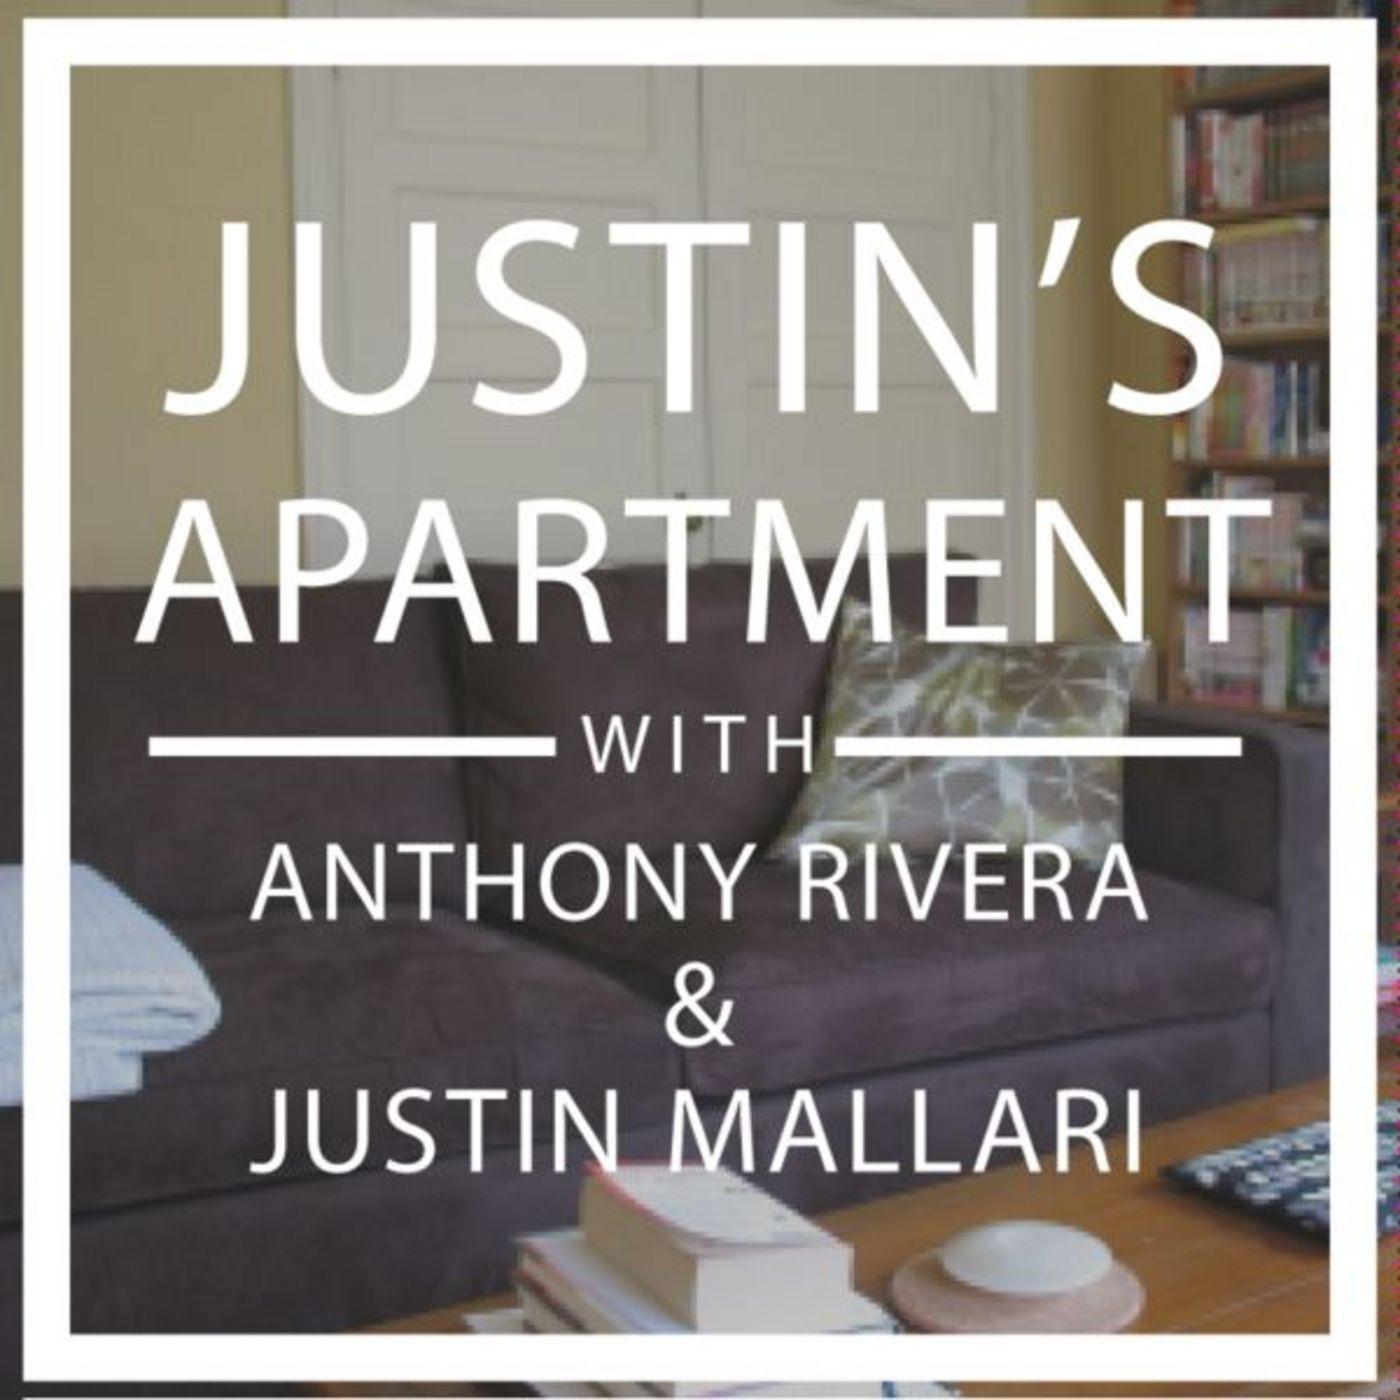 <![CDATA[Justin's Apartment]]>